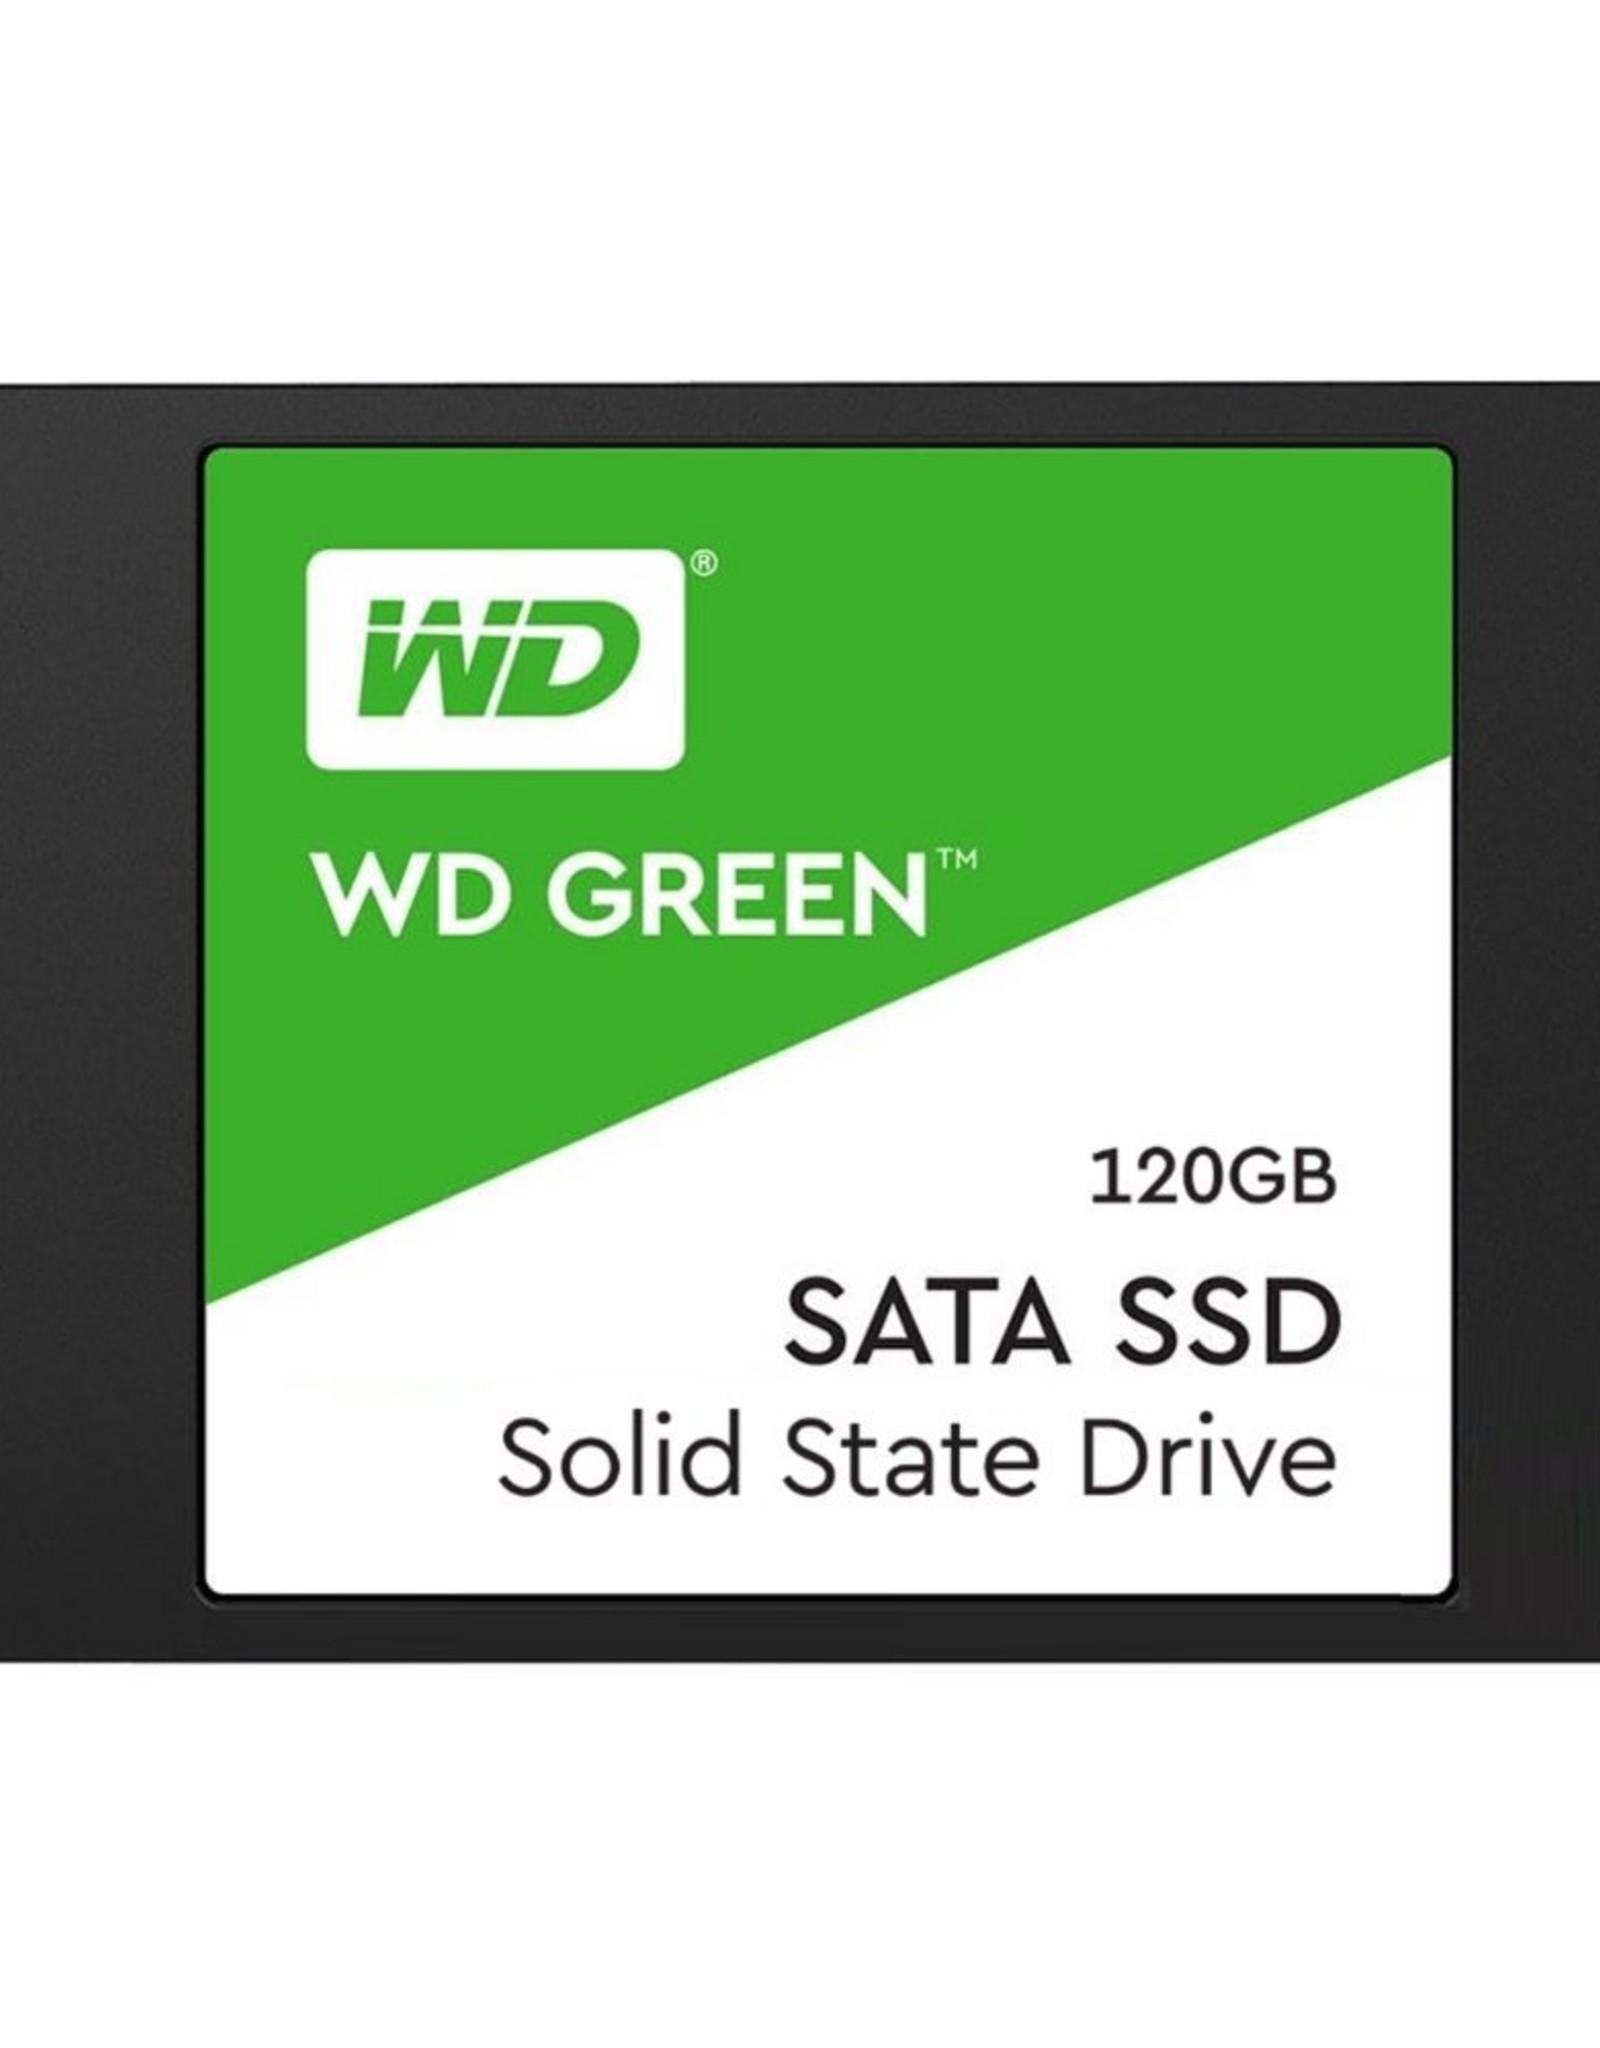 SSD WD Green 2.5inch 120GB 540MB/s Read 430MB/s